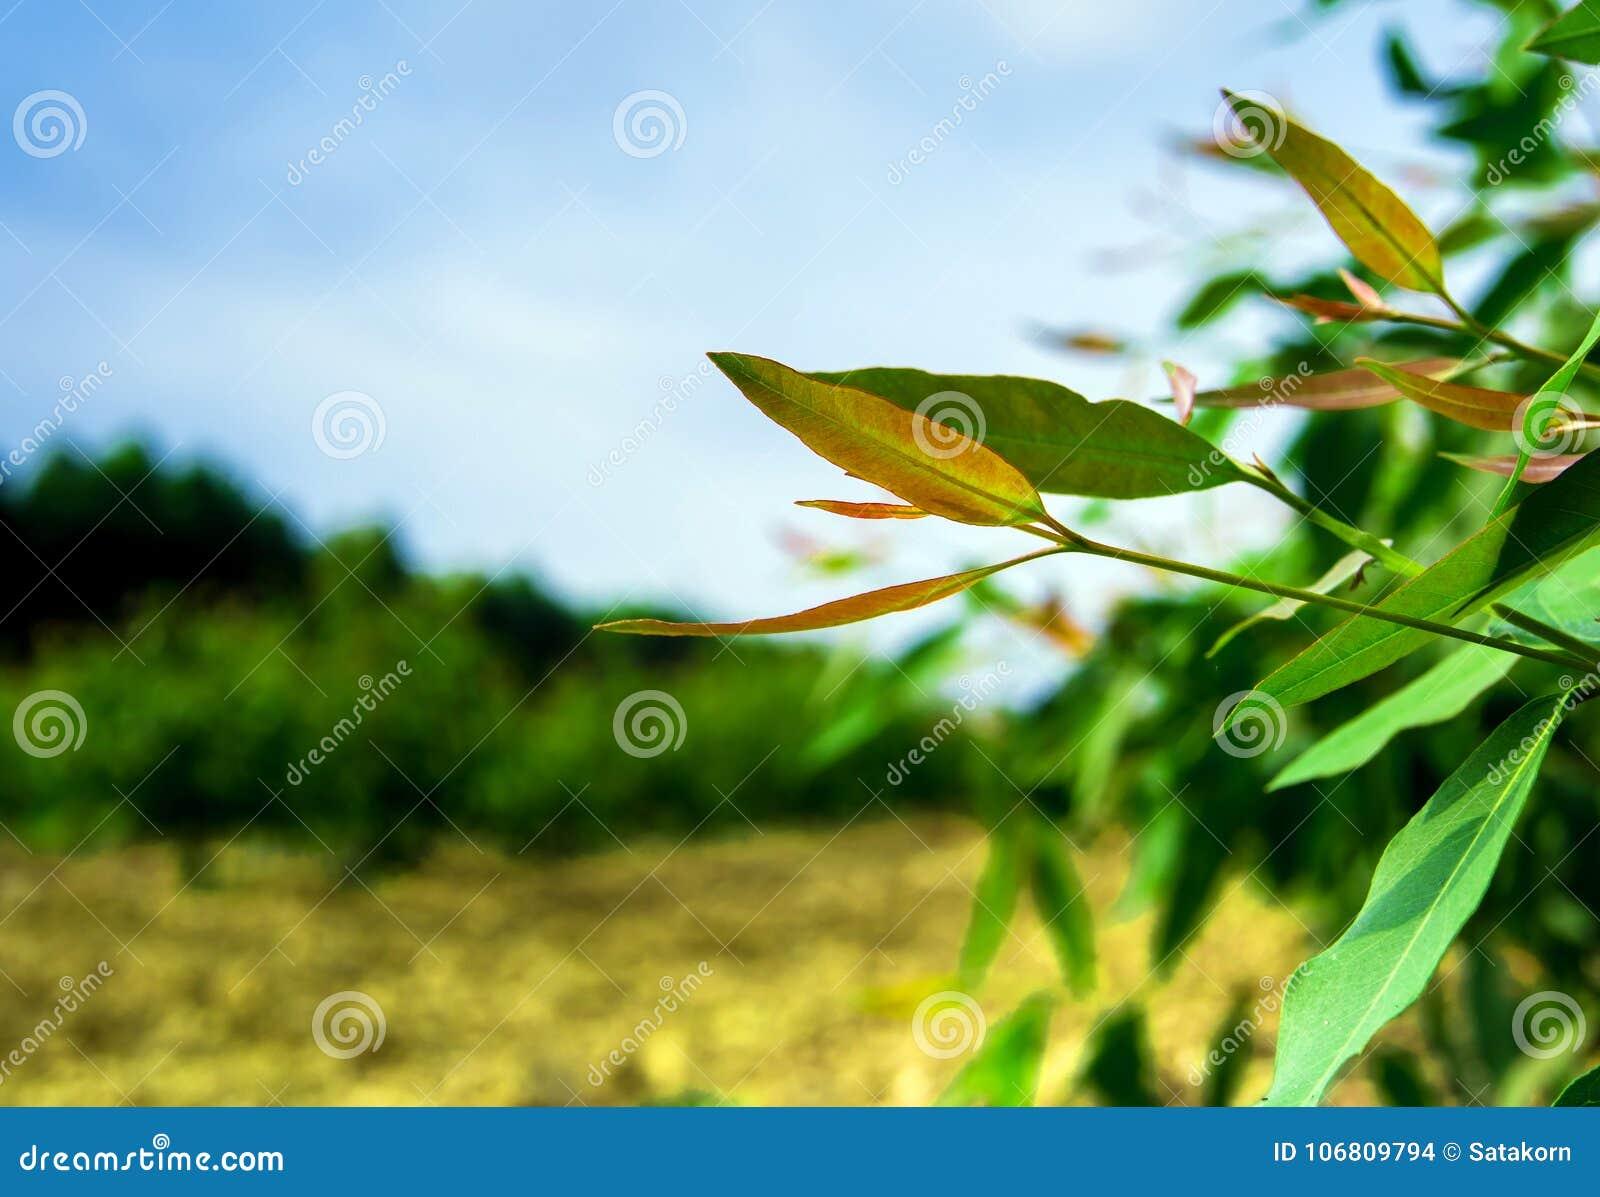 Row Of Eucalyptus Tree In The Plantation Stock Photo Image Of